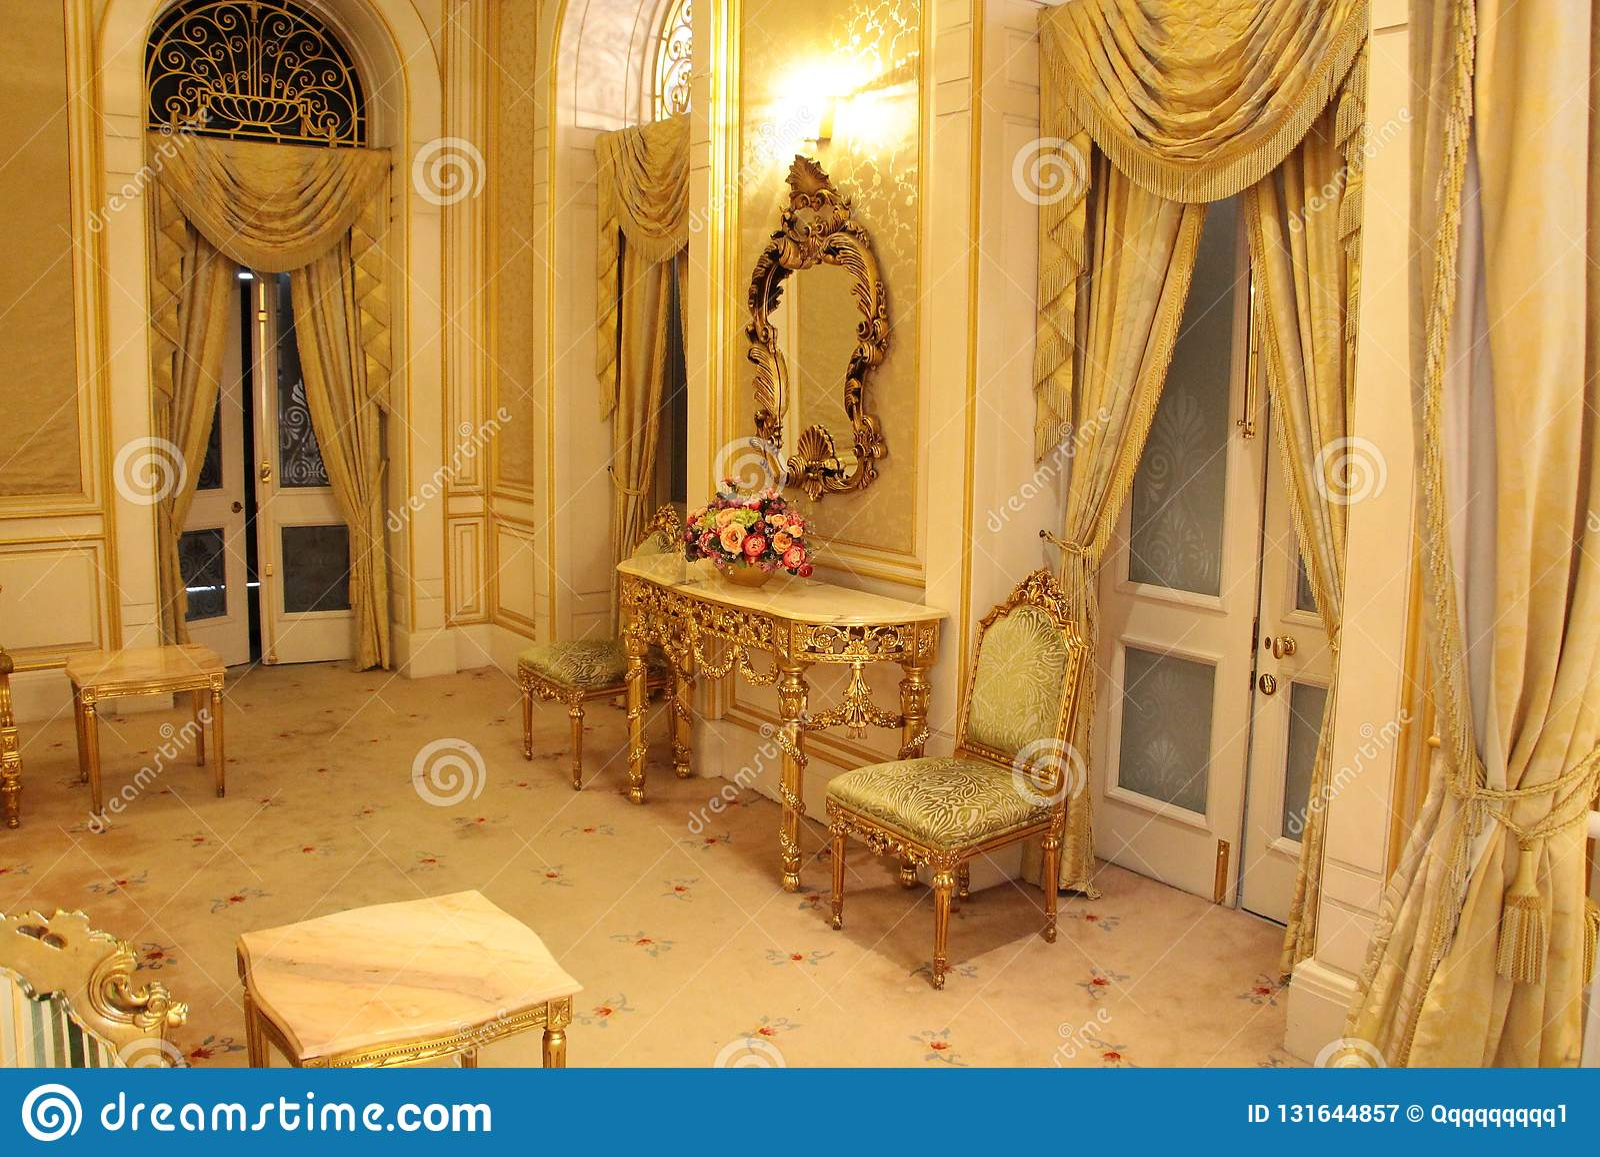 Klassisk inre  Istana Negara, Jalan Tuanku Abdul Halim slottkunglig person